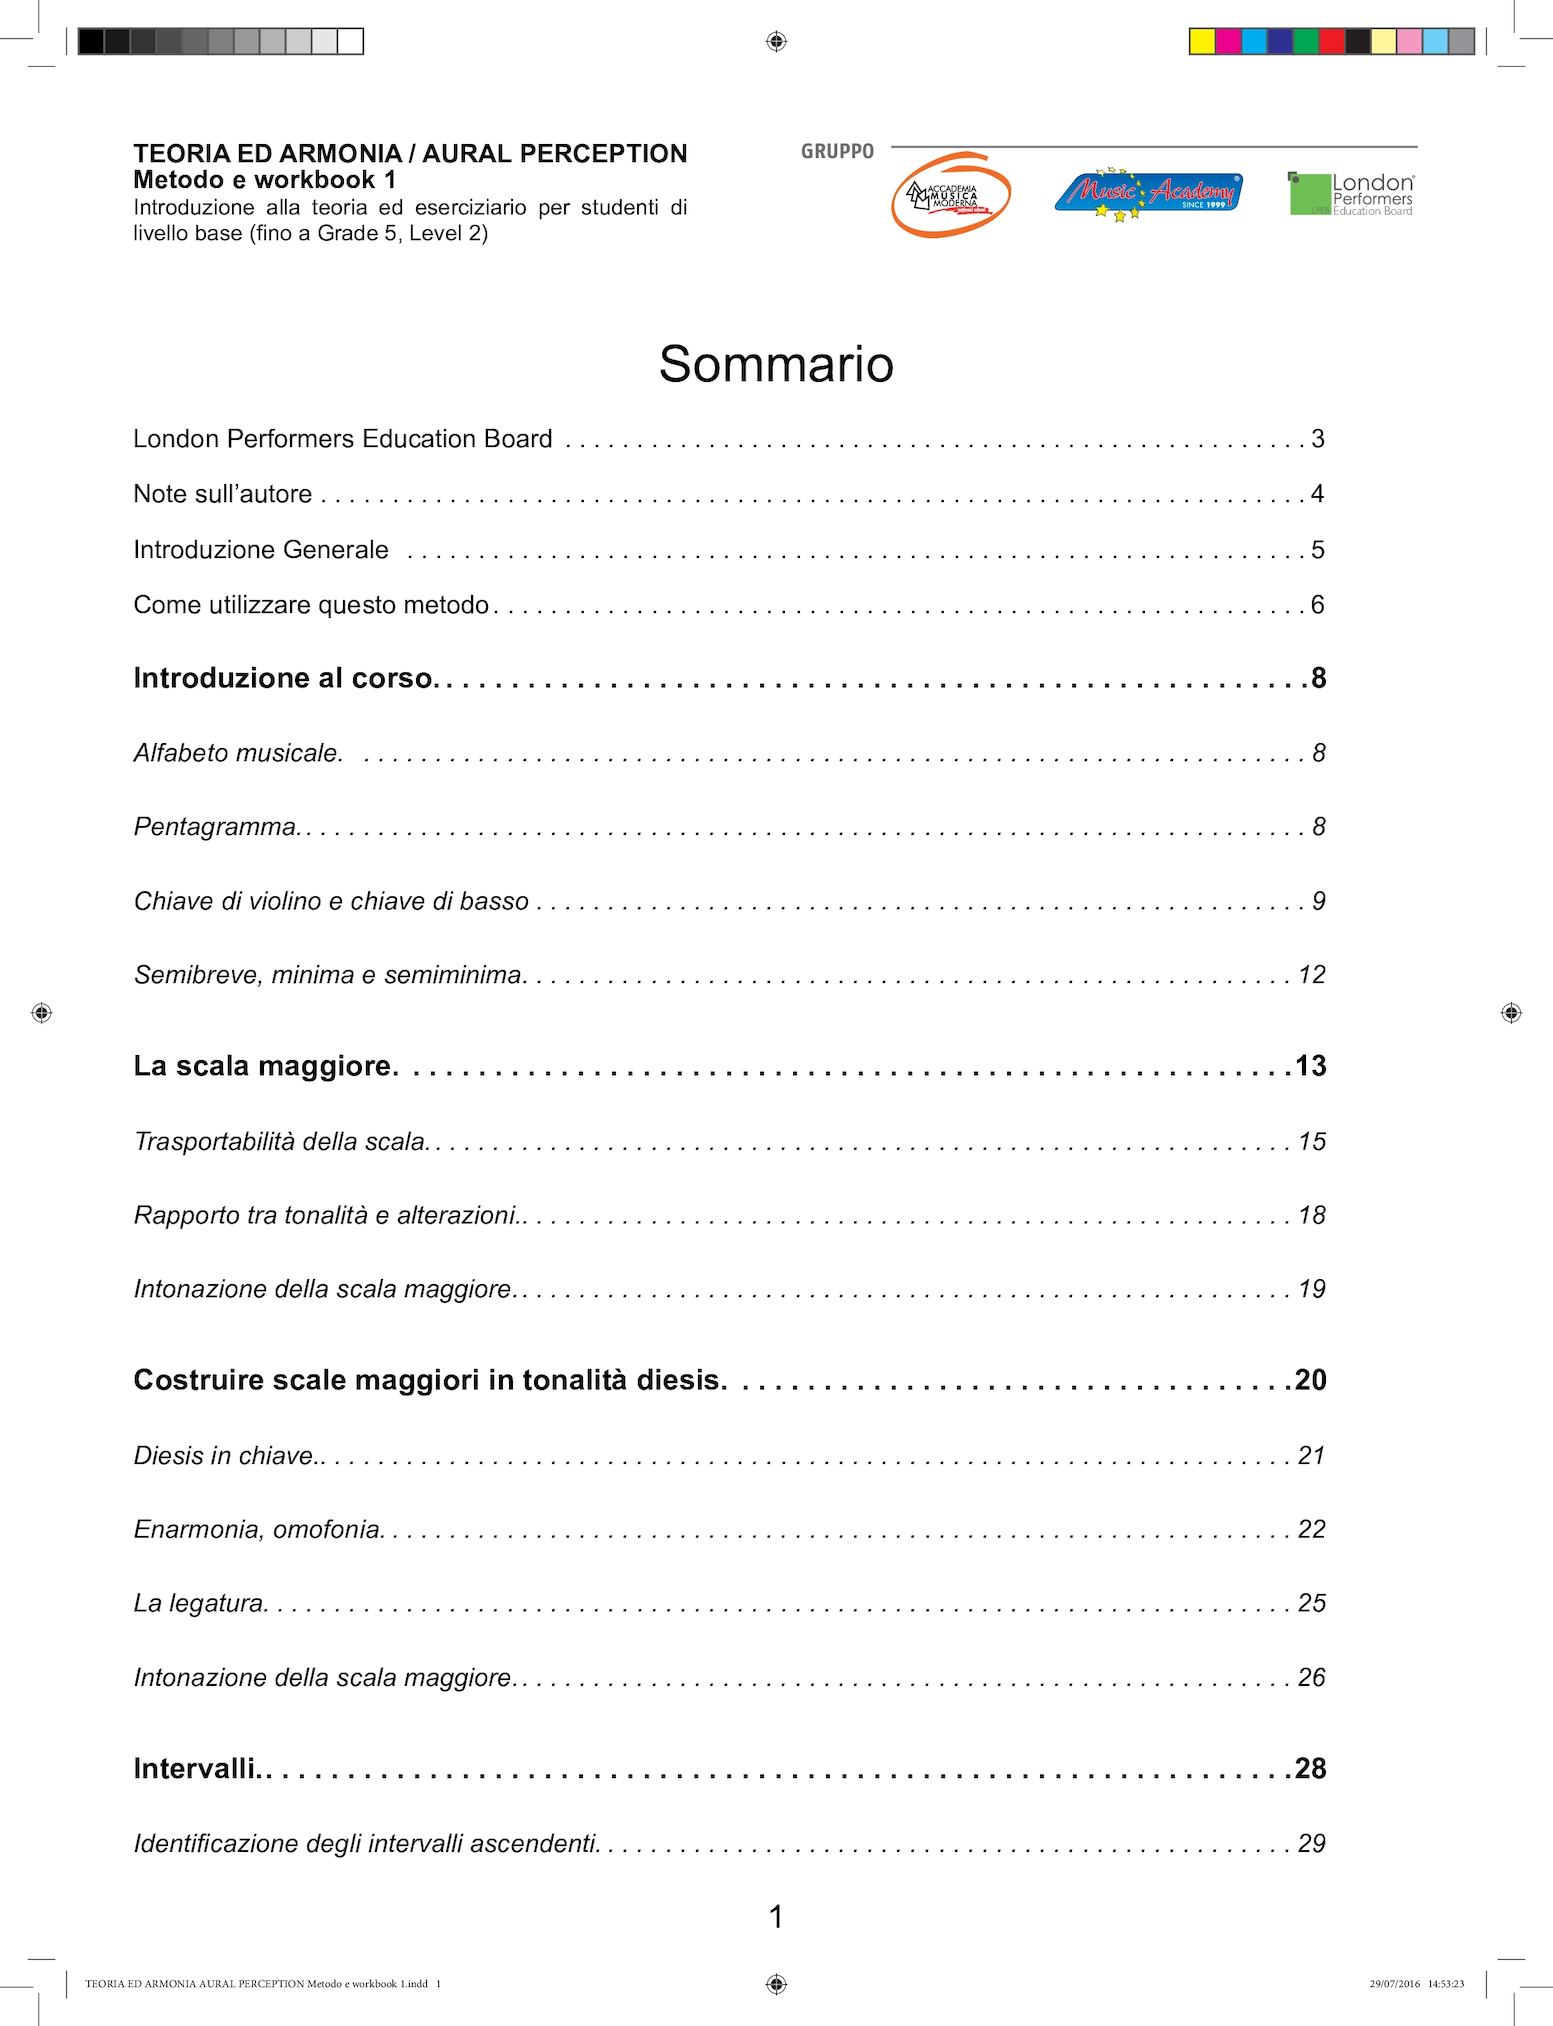 TEORIA ED ARMONIA AURAL PERCEPTION Metodo E Workbook 1